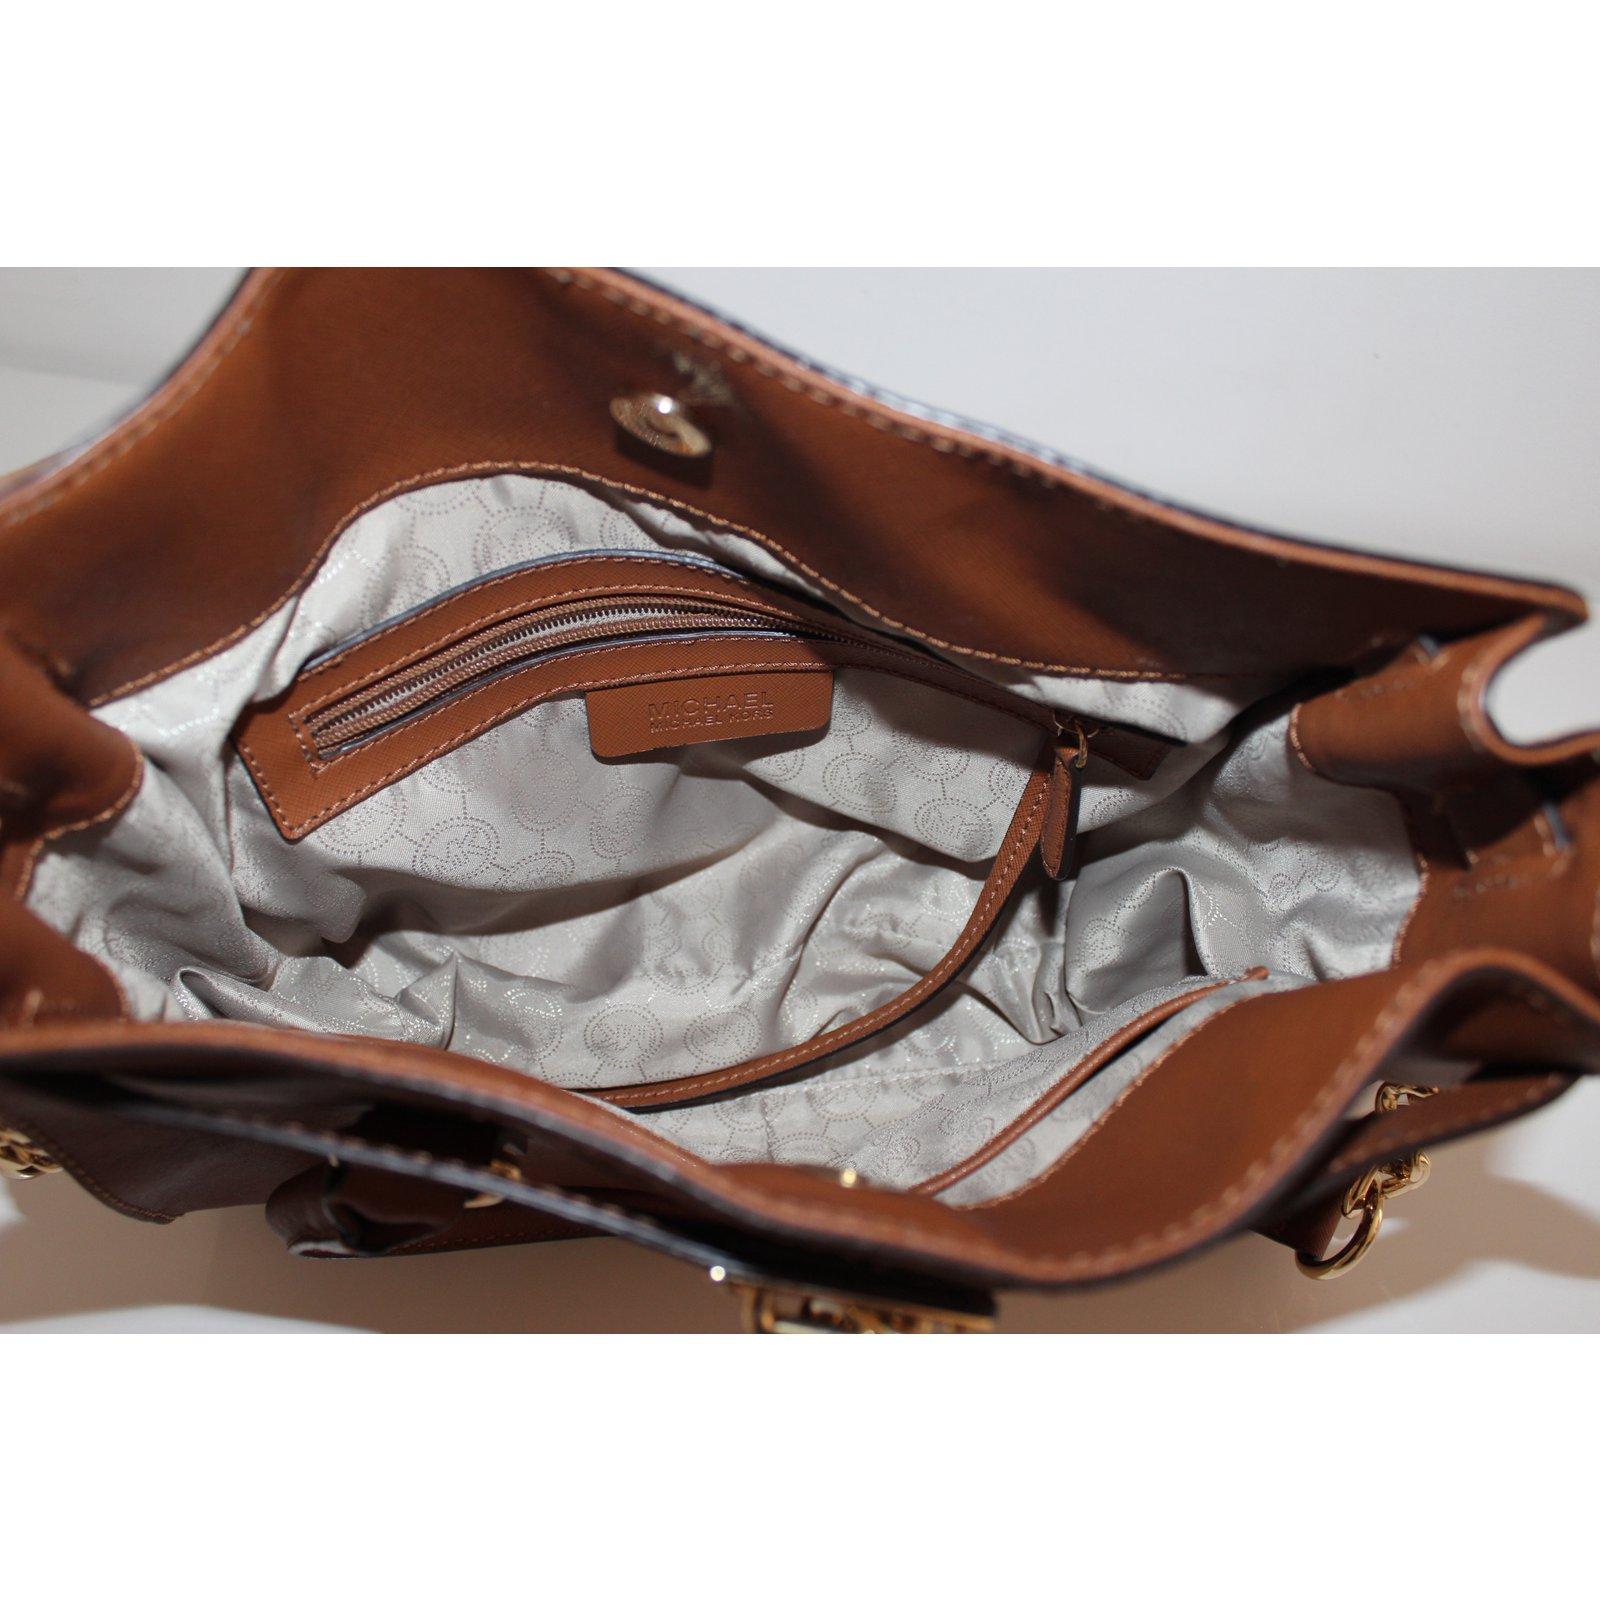 2de38c703983 Michael Kors HAMILTON Handbags Leather Caramel ref.48117 - Joli Closet